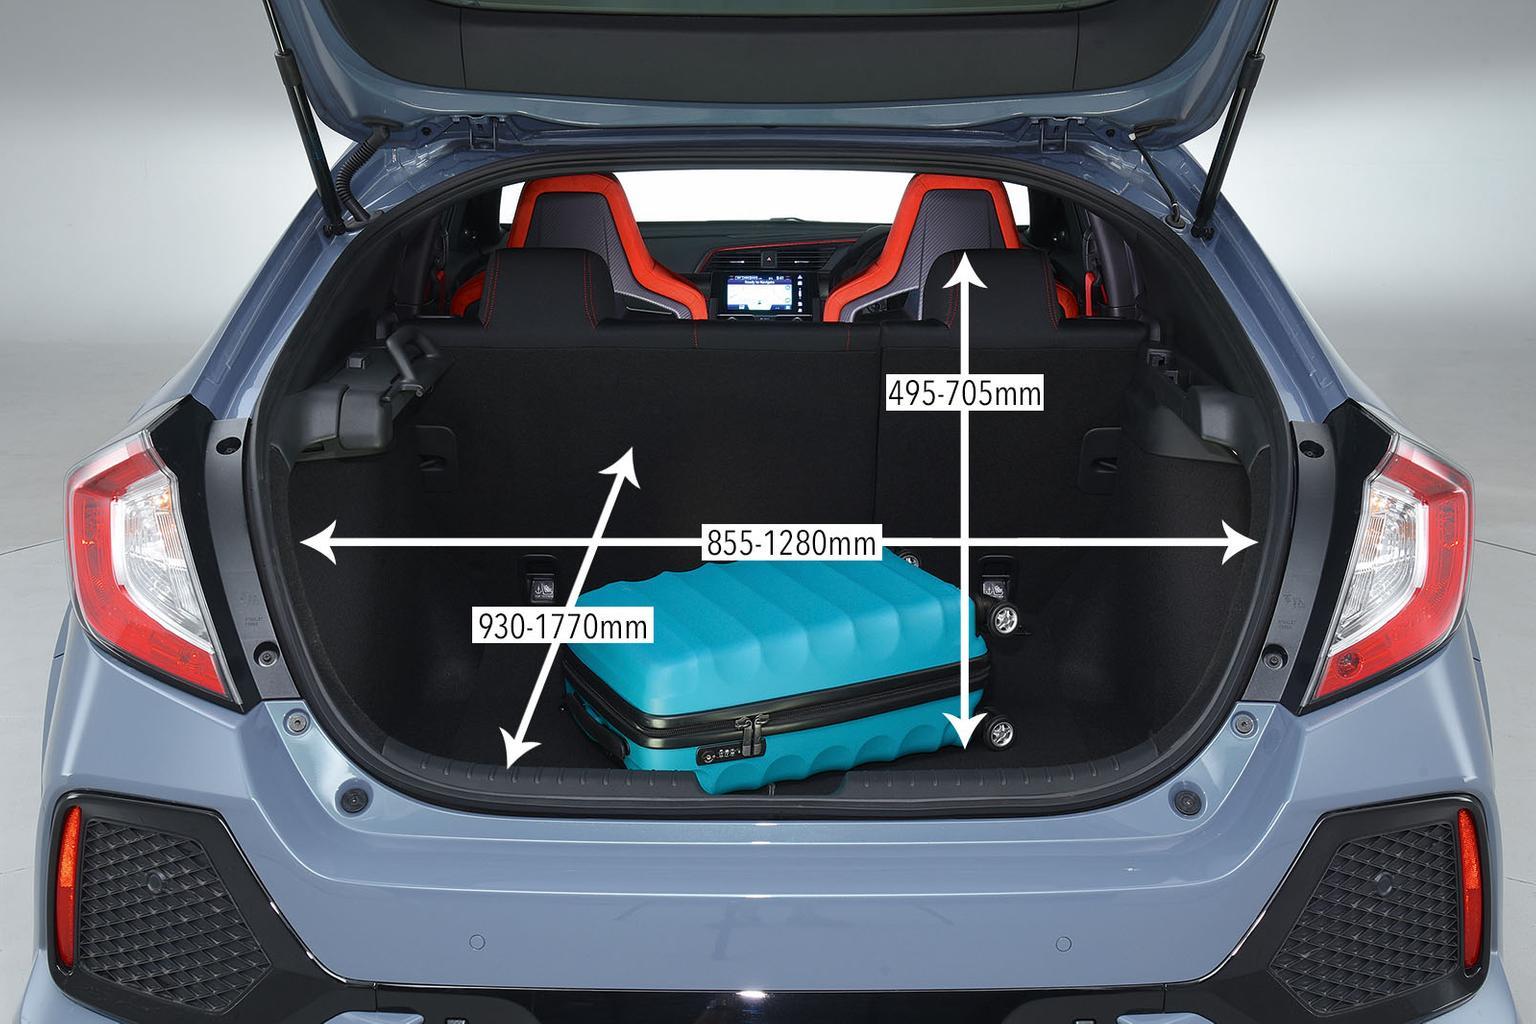 New Honda Civic Type R vs BMW M140i vs Ford Focus RS